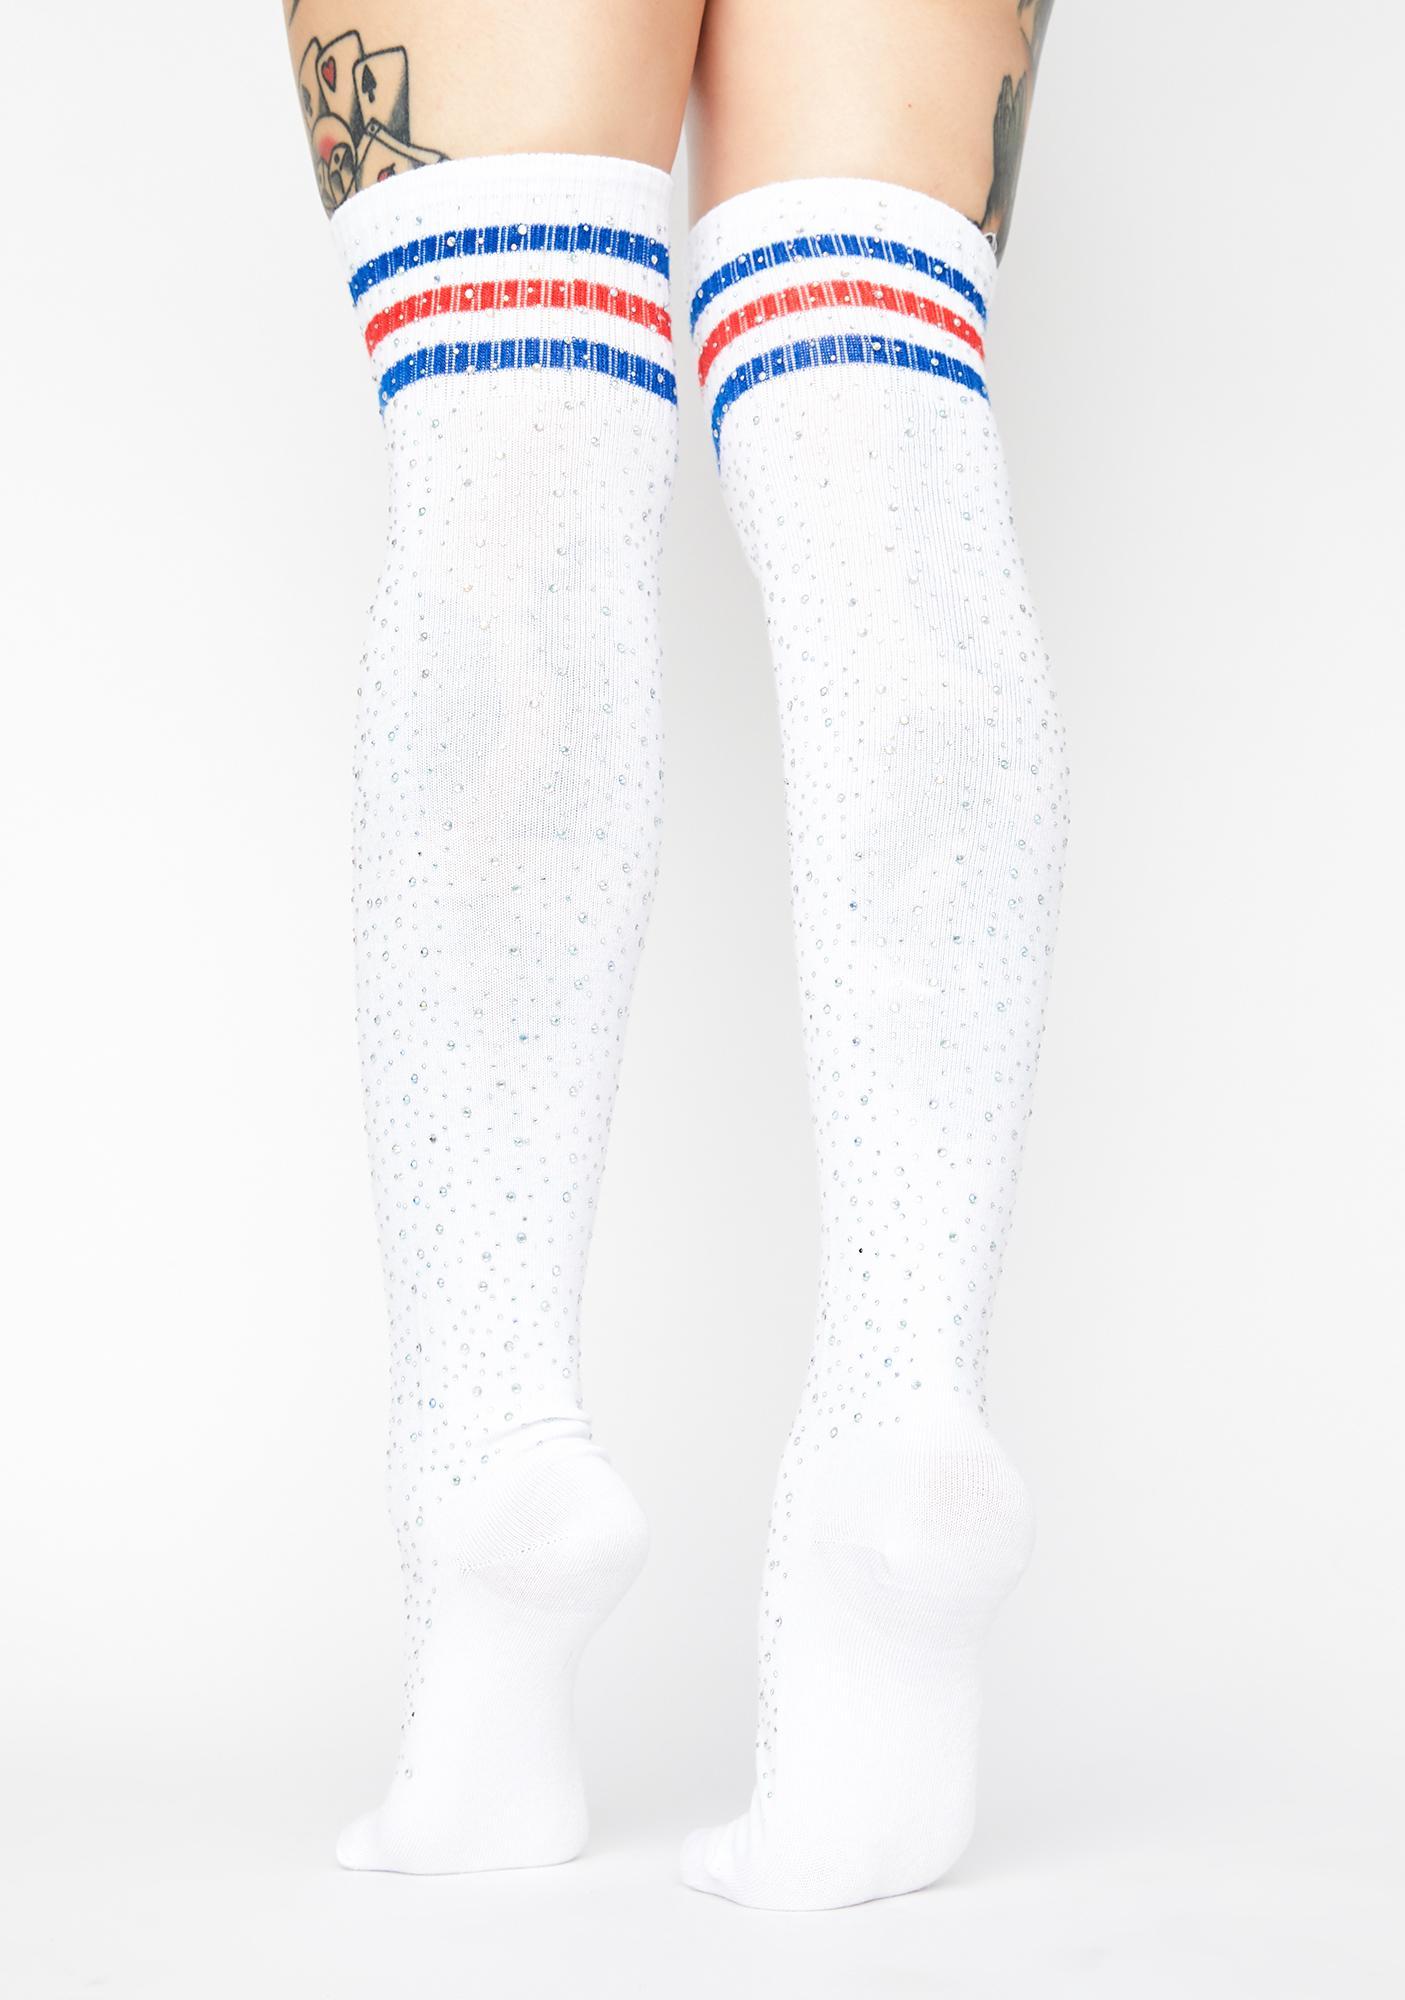 Royal Cosmic Rivals Thigh High Socks